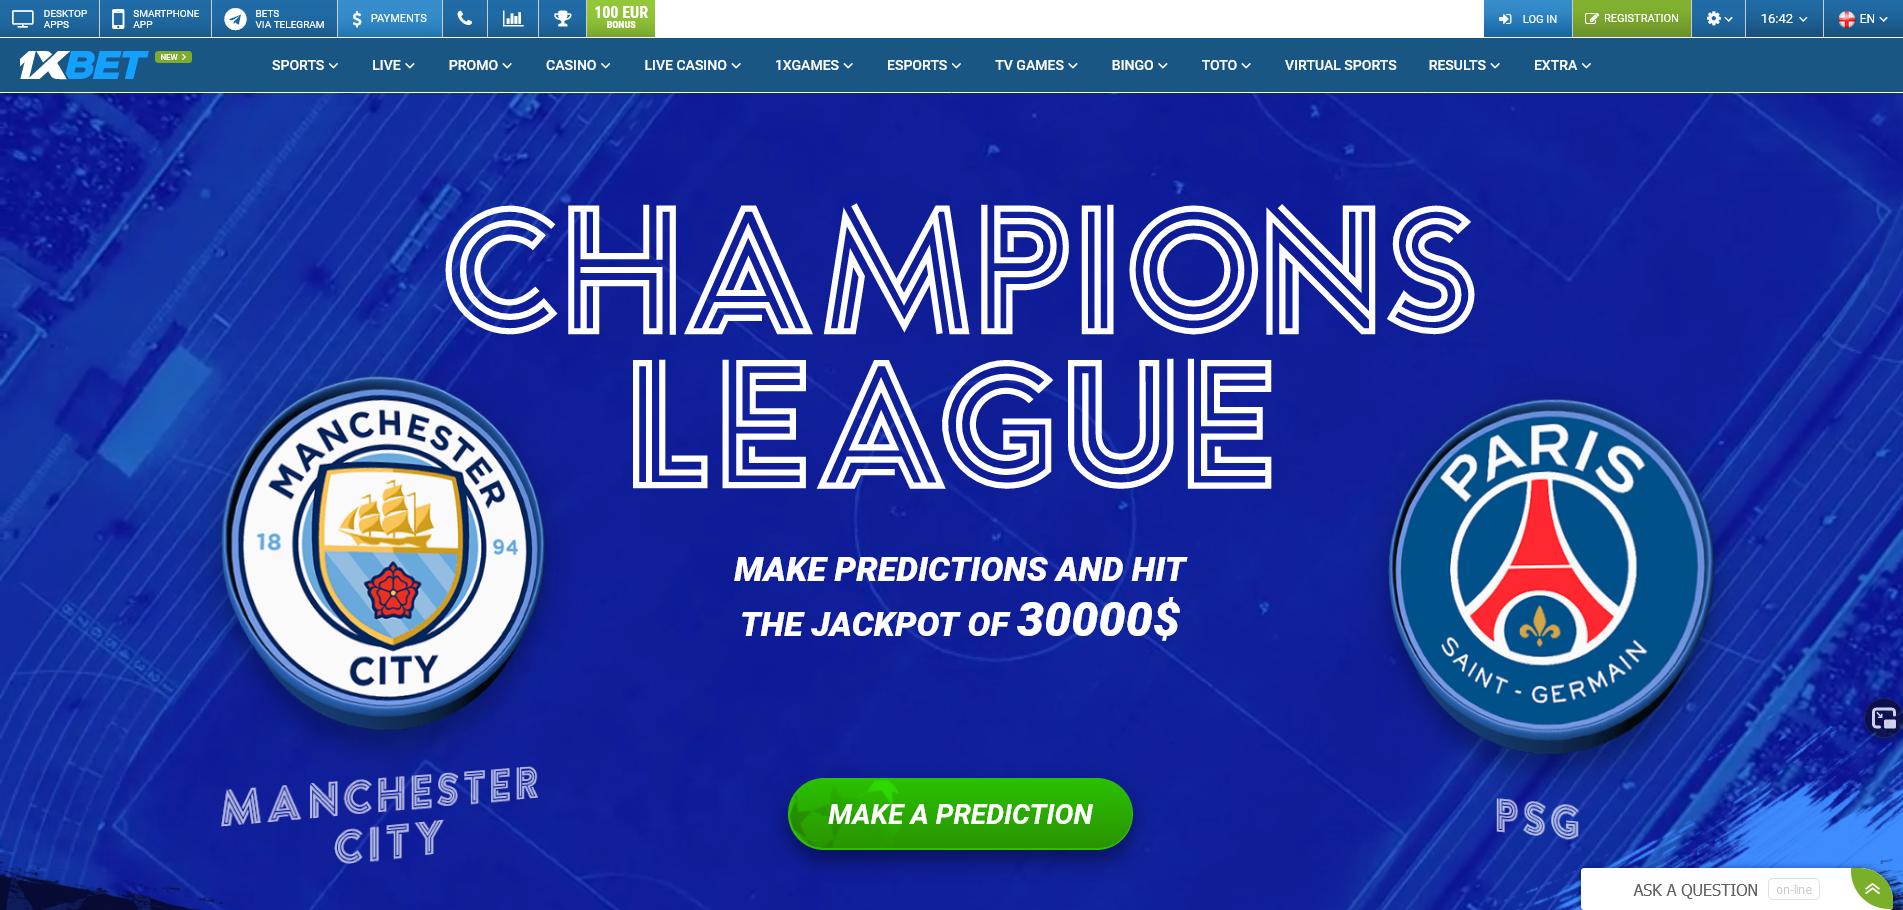 1xBet_championsleague